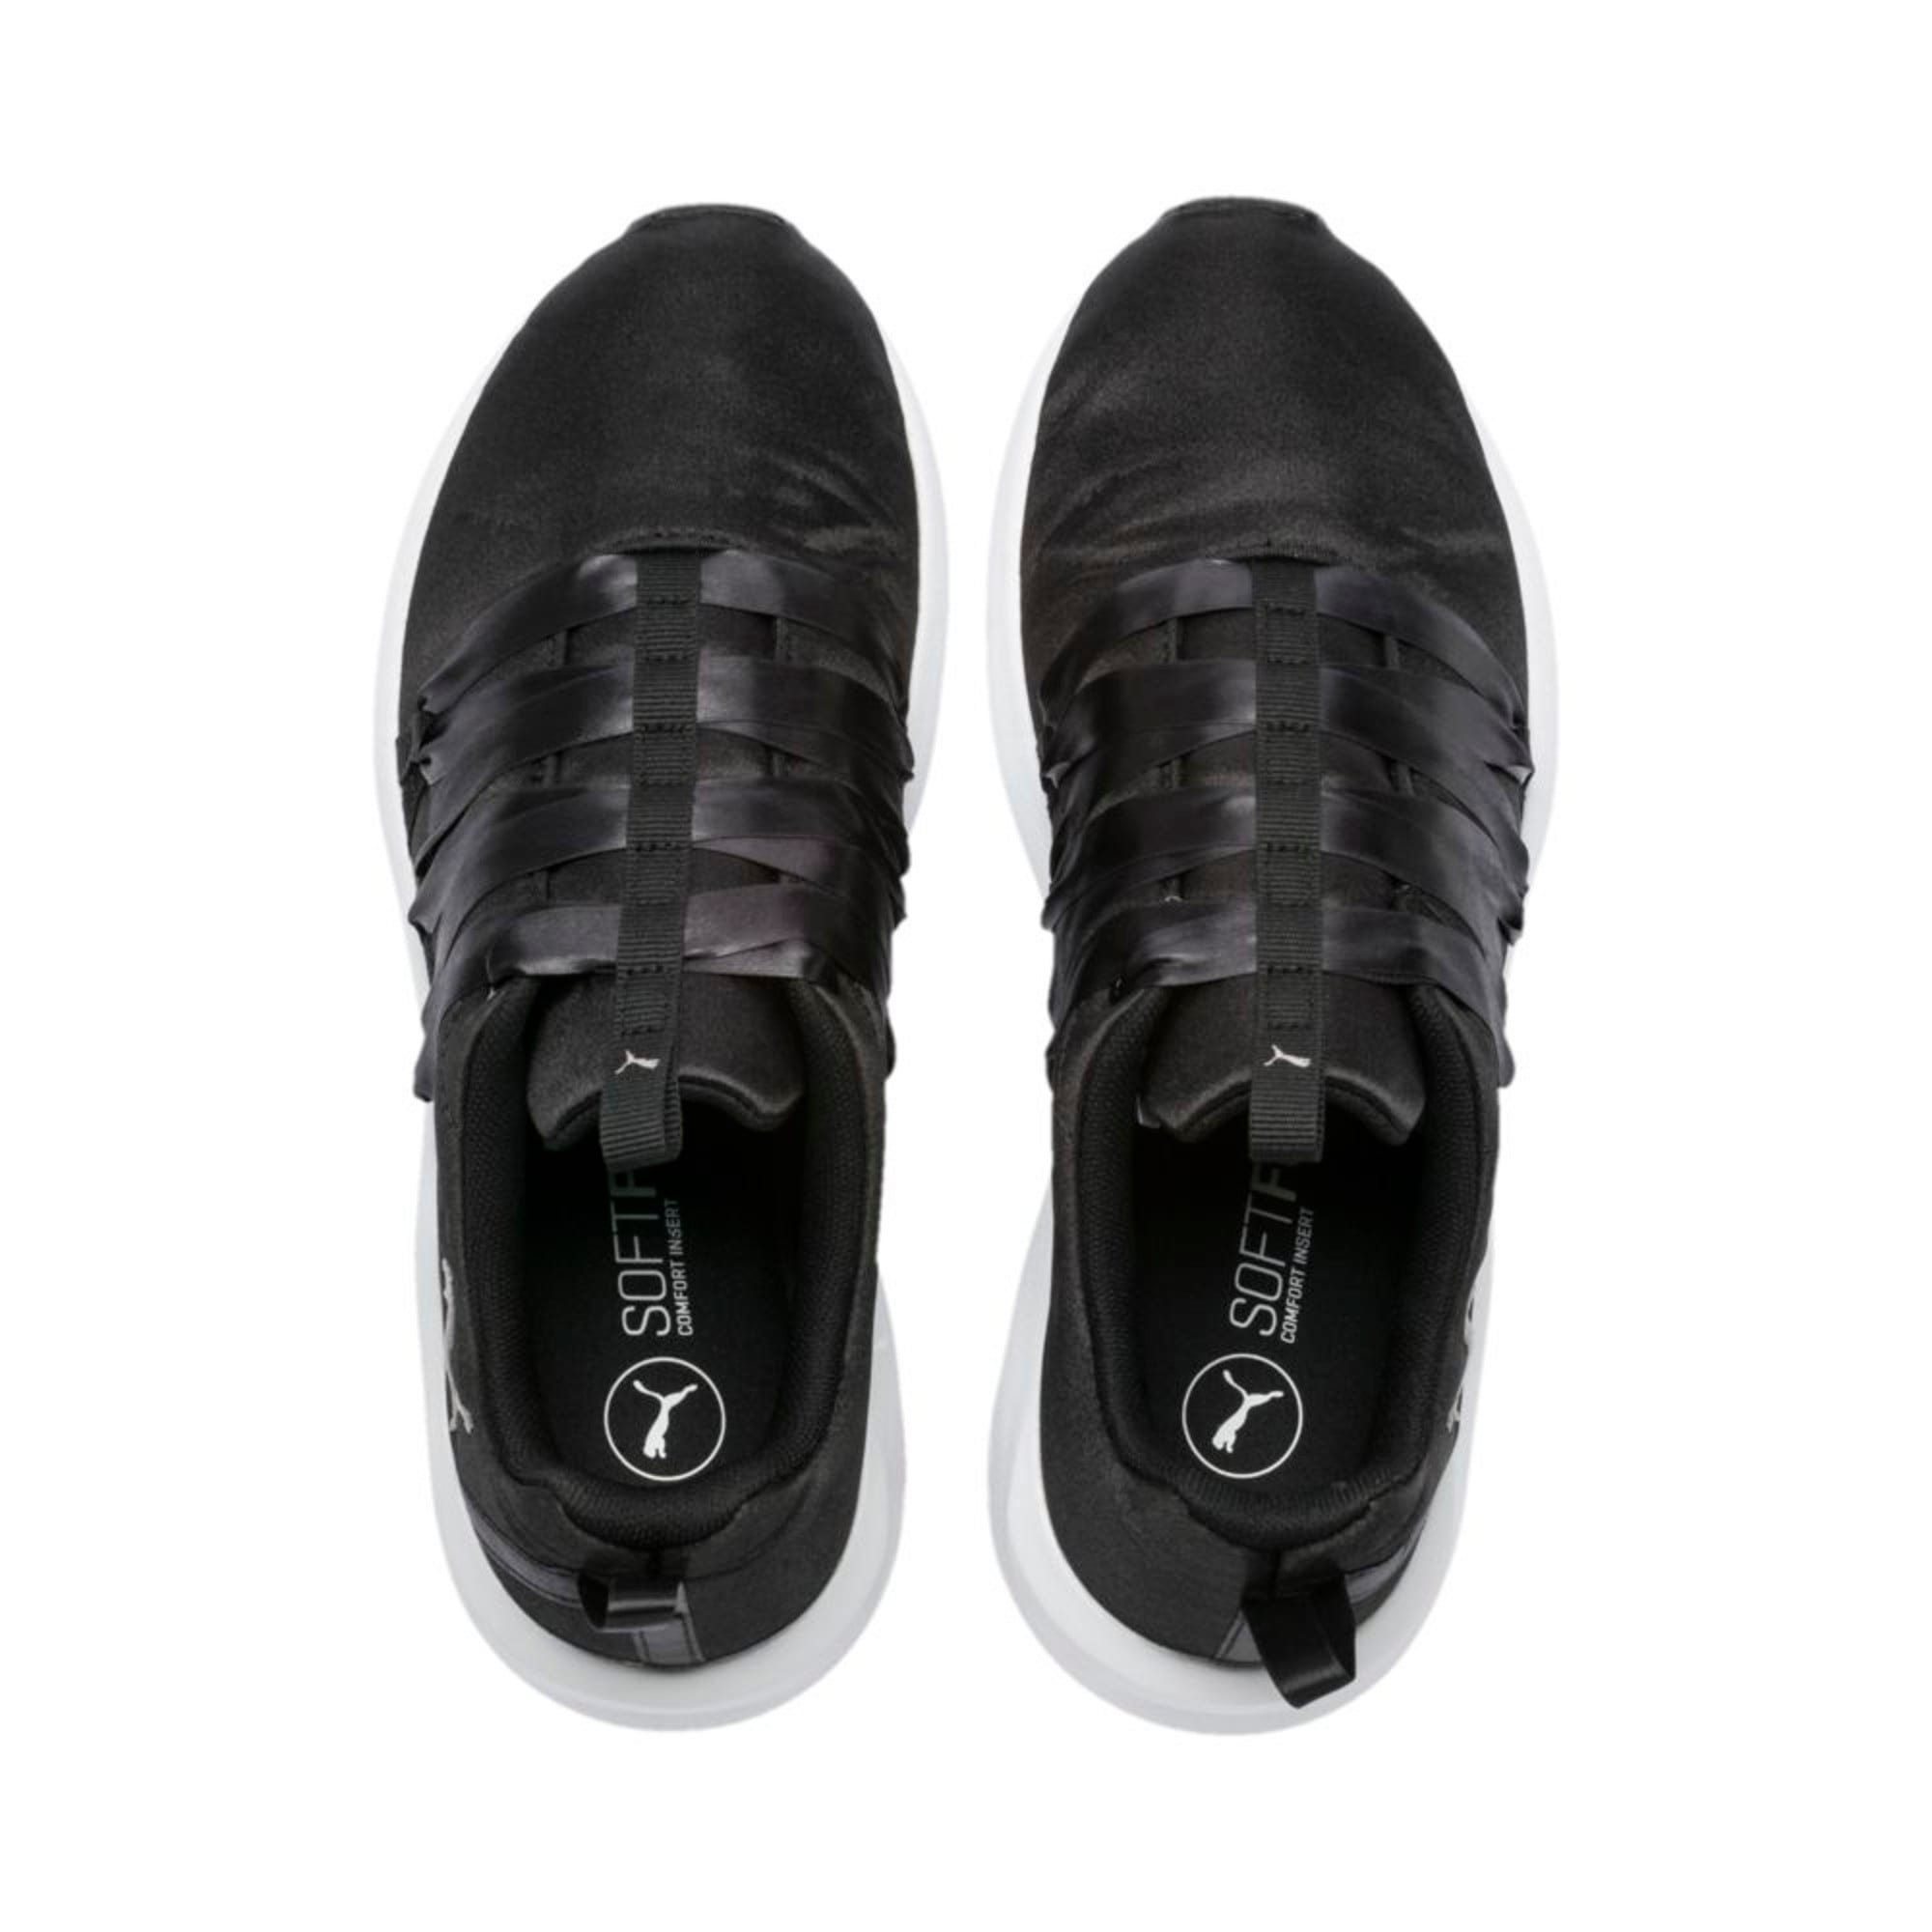 Thumbnail 3 of Prowl Alt Satin Women's Training Shoes, Puma Black-Puma White, medium-IND